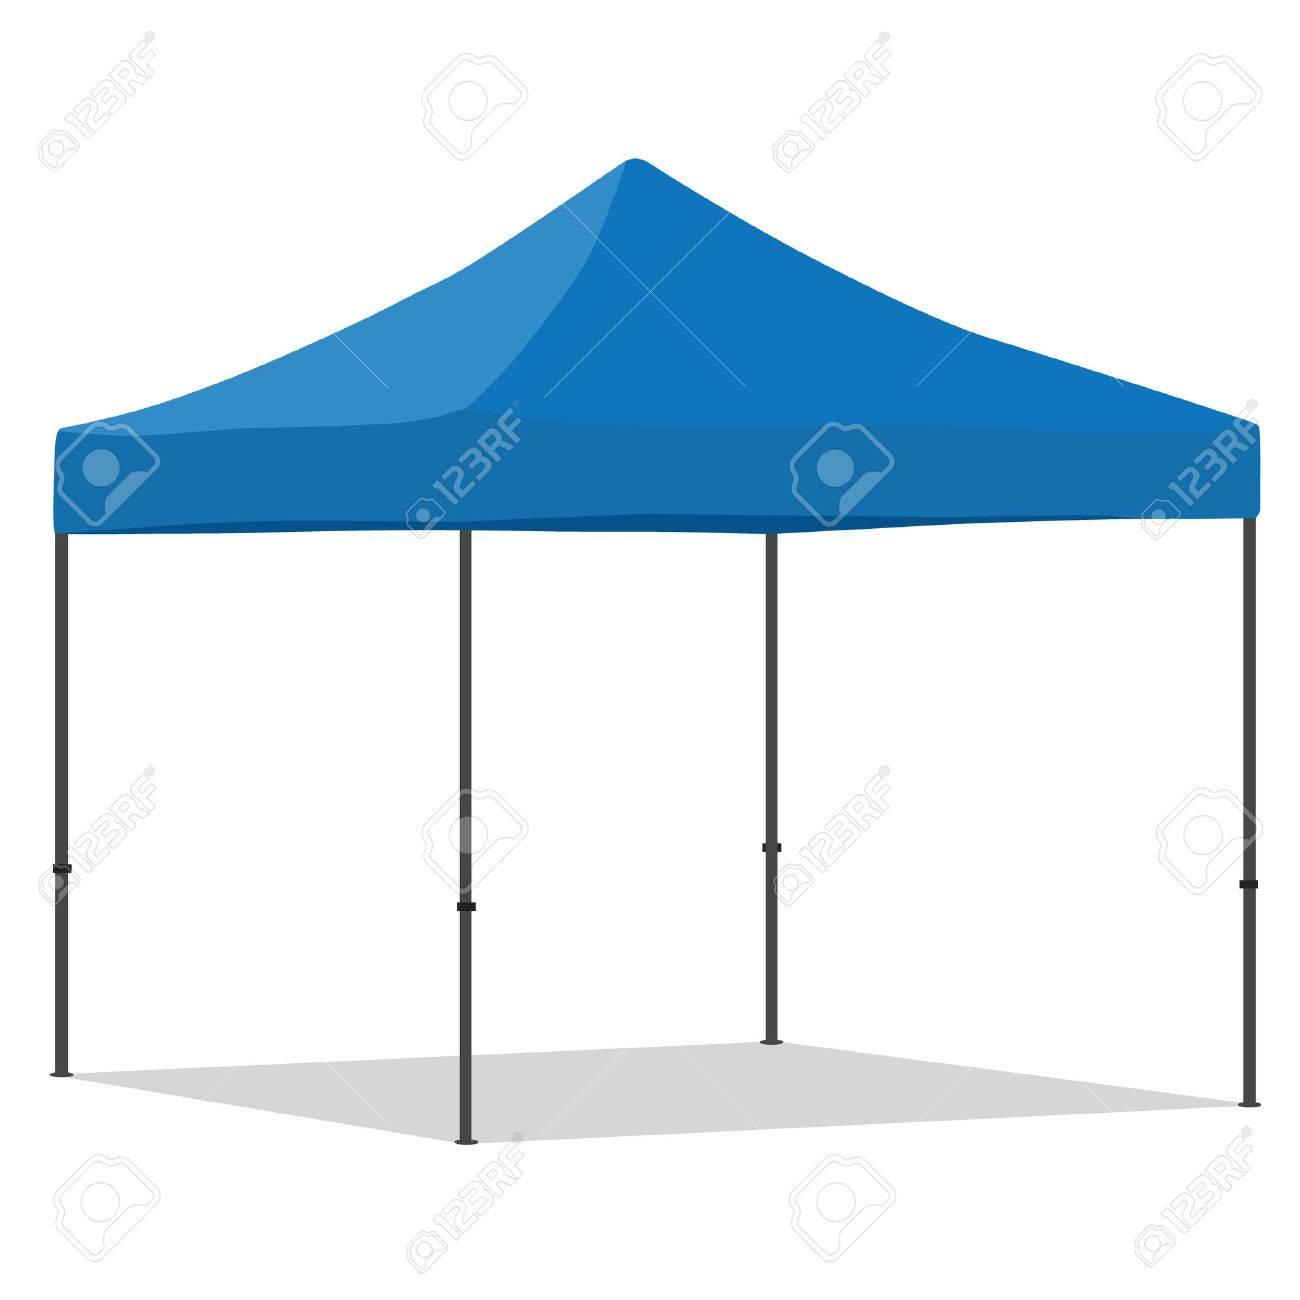 Blue folding tent vector illustration. Pop up gazebo. Canopy tent Stock Vector - 51954872  sc 1 st  123RF.com & Blue Folding Tent Vector Illustration. Pop Up Gazebo. Canopy ...